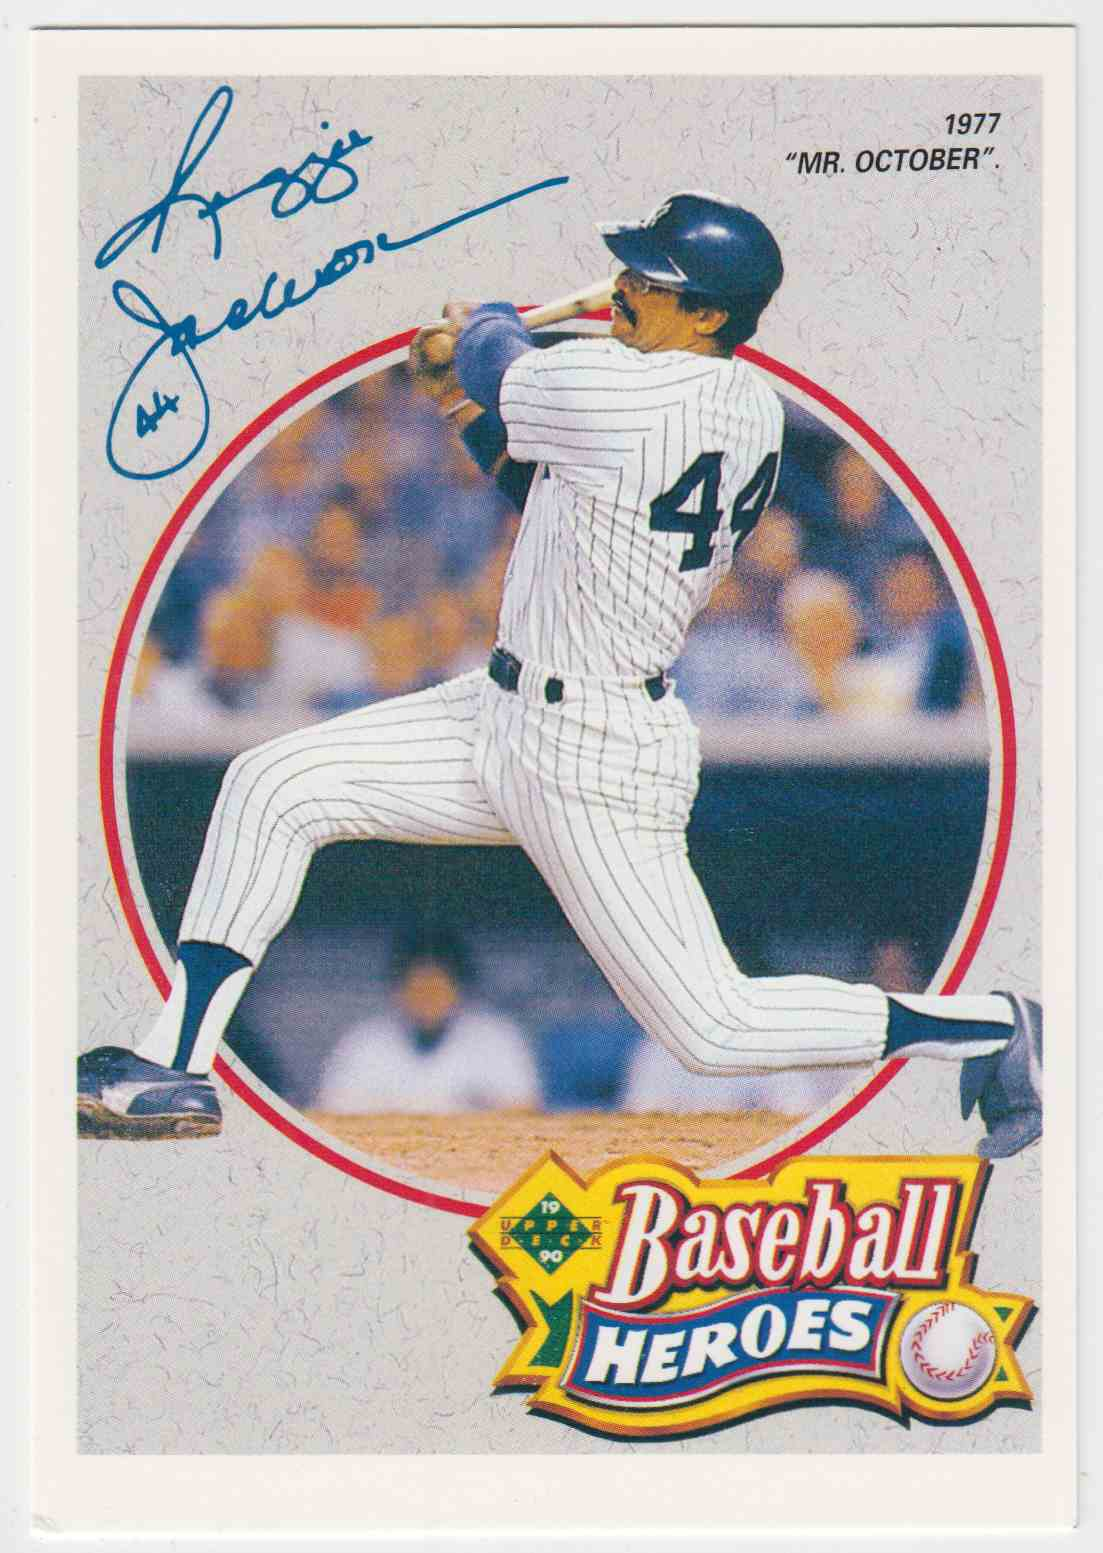 1990 Upper Deck Baseball Heroes Jumbo Reggie Jackson #3 card front image